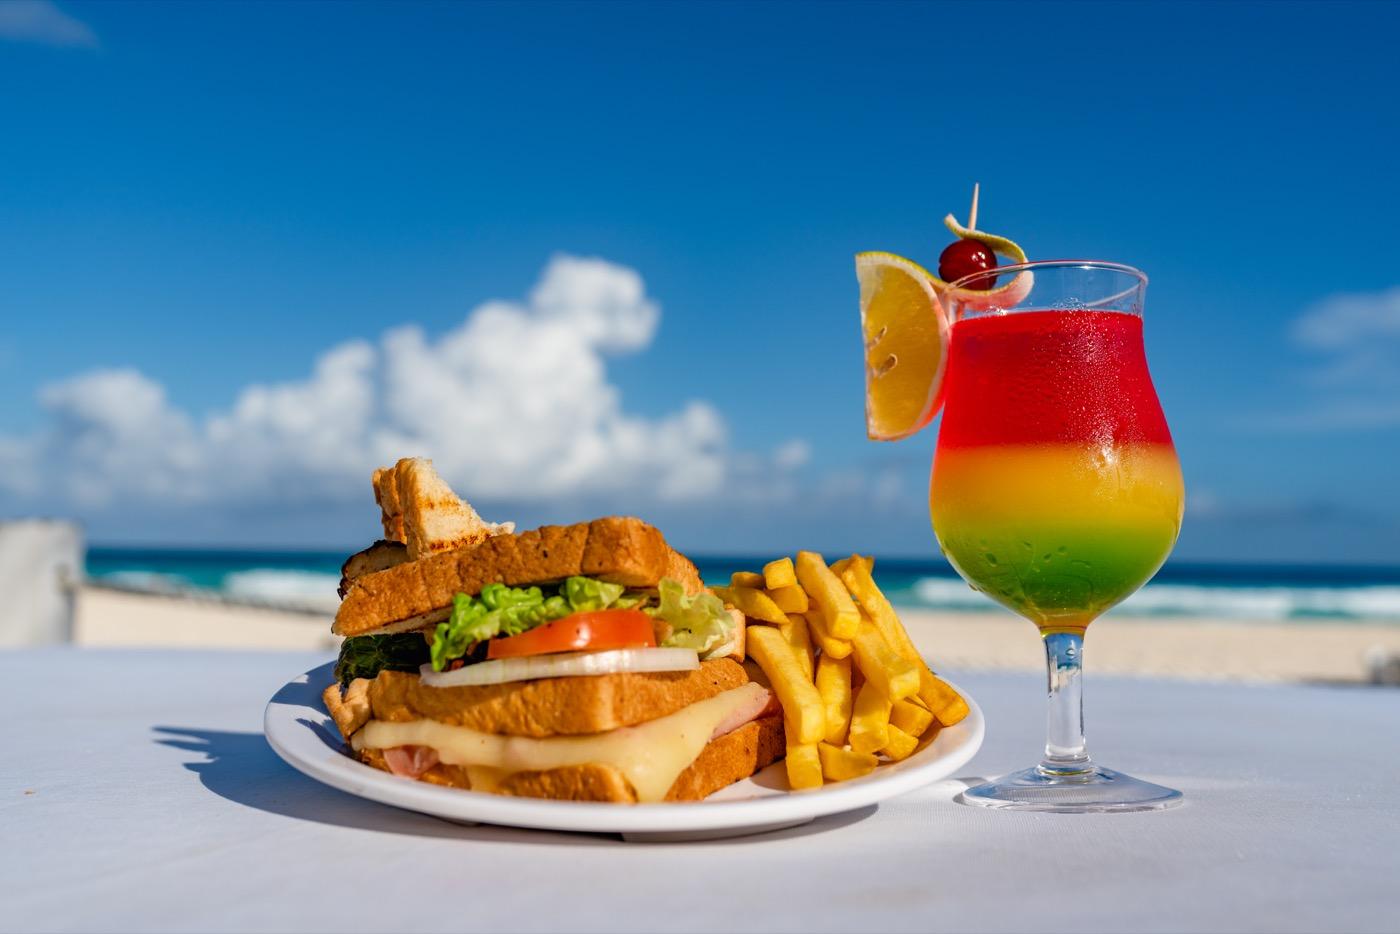 Comida en la playa del hotel Oh! Cancun On The Beach